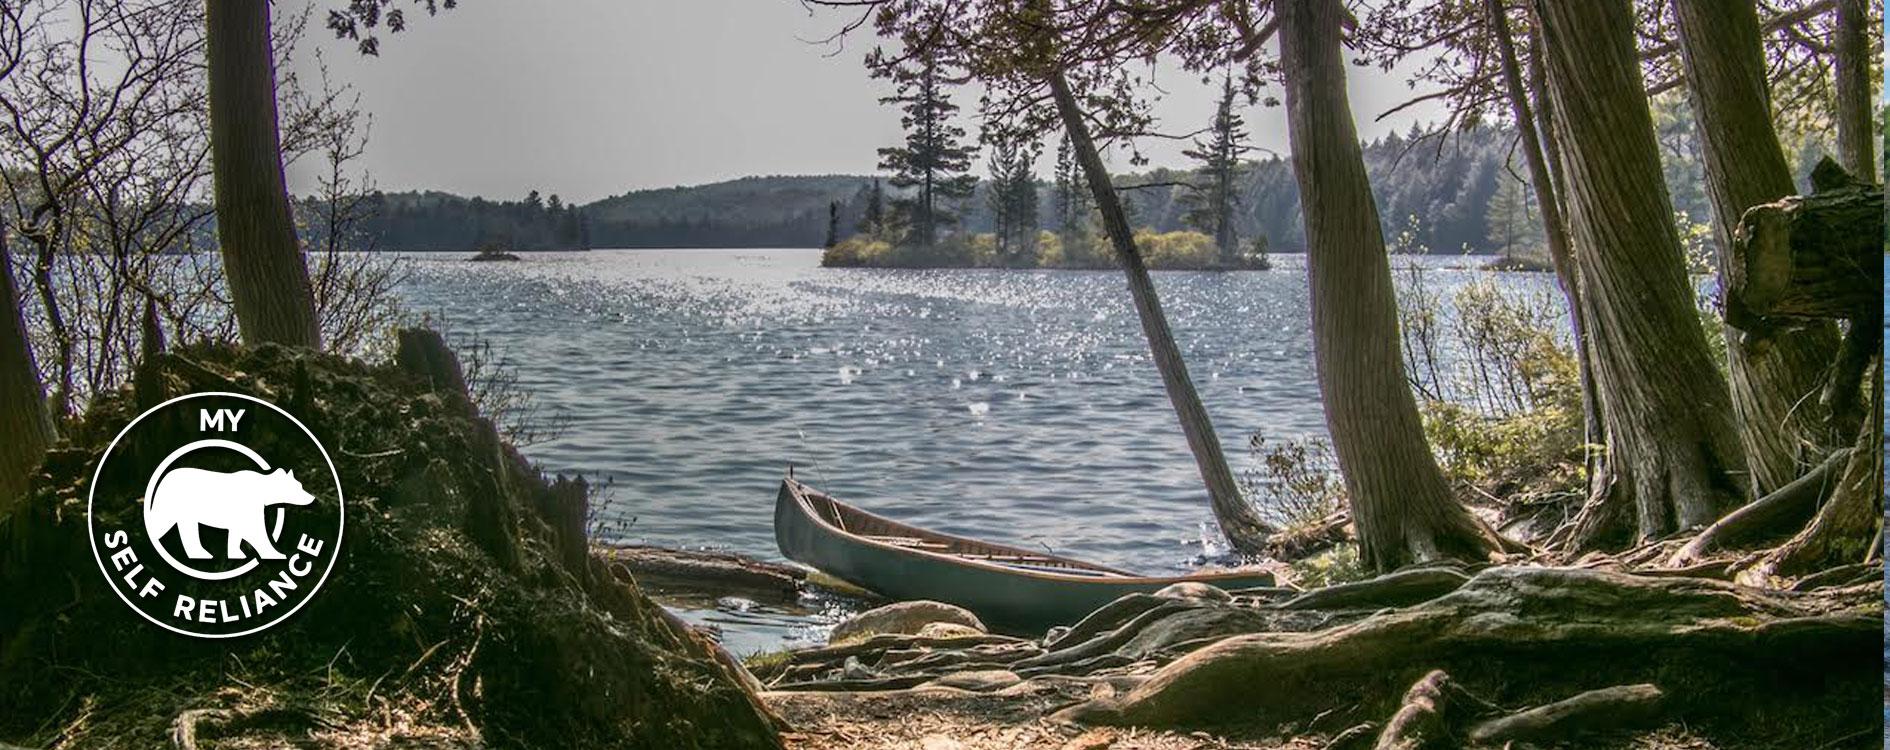 Calendar Myanmar : An algonquin park solo canoe trip by shawn james